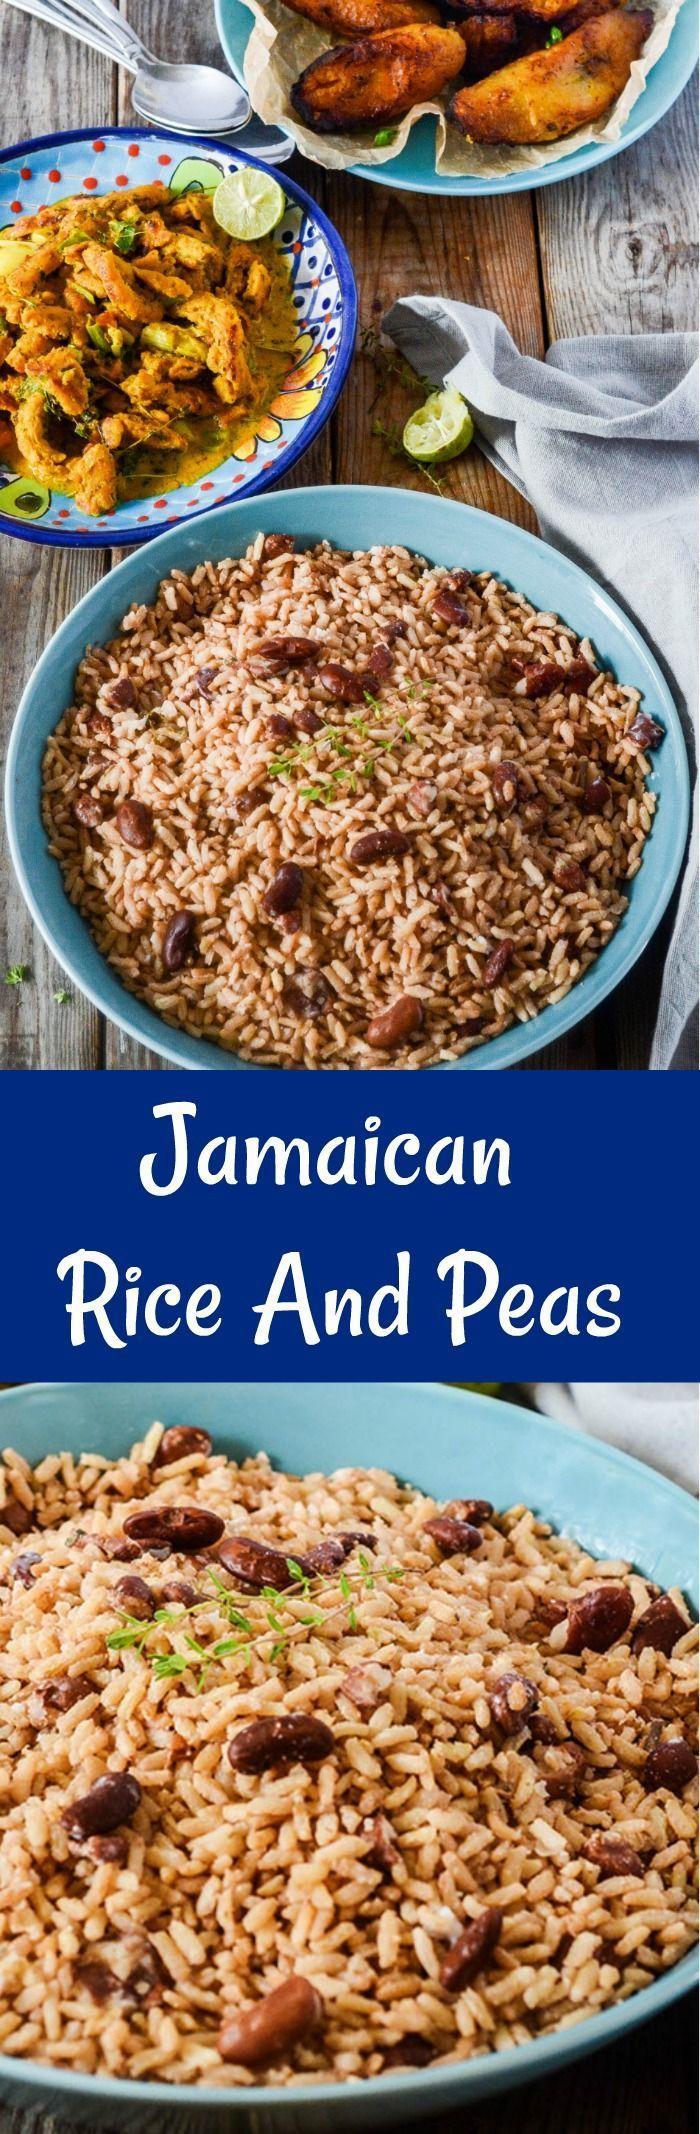 jamaican rice and peas recipe  recipes jamaican rice